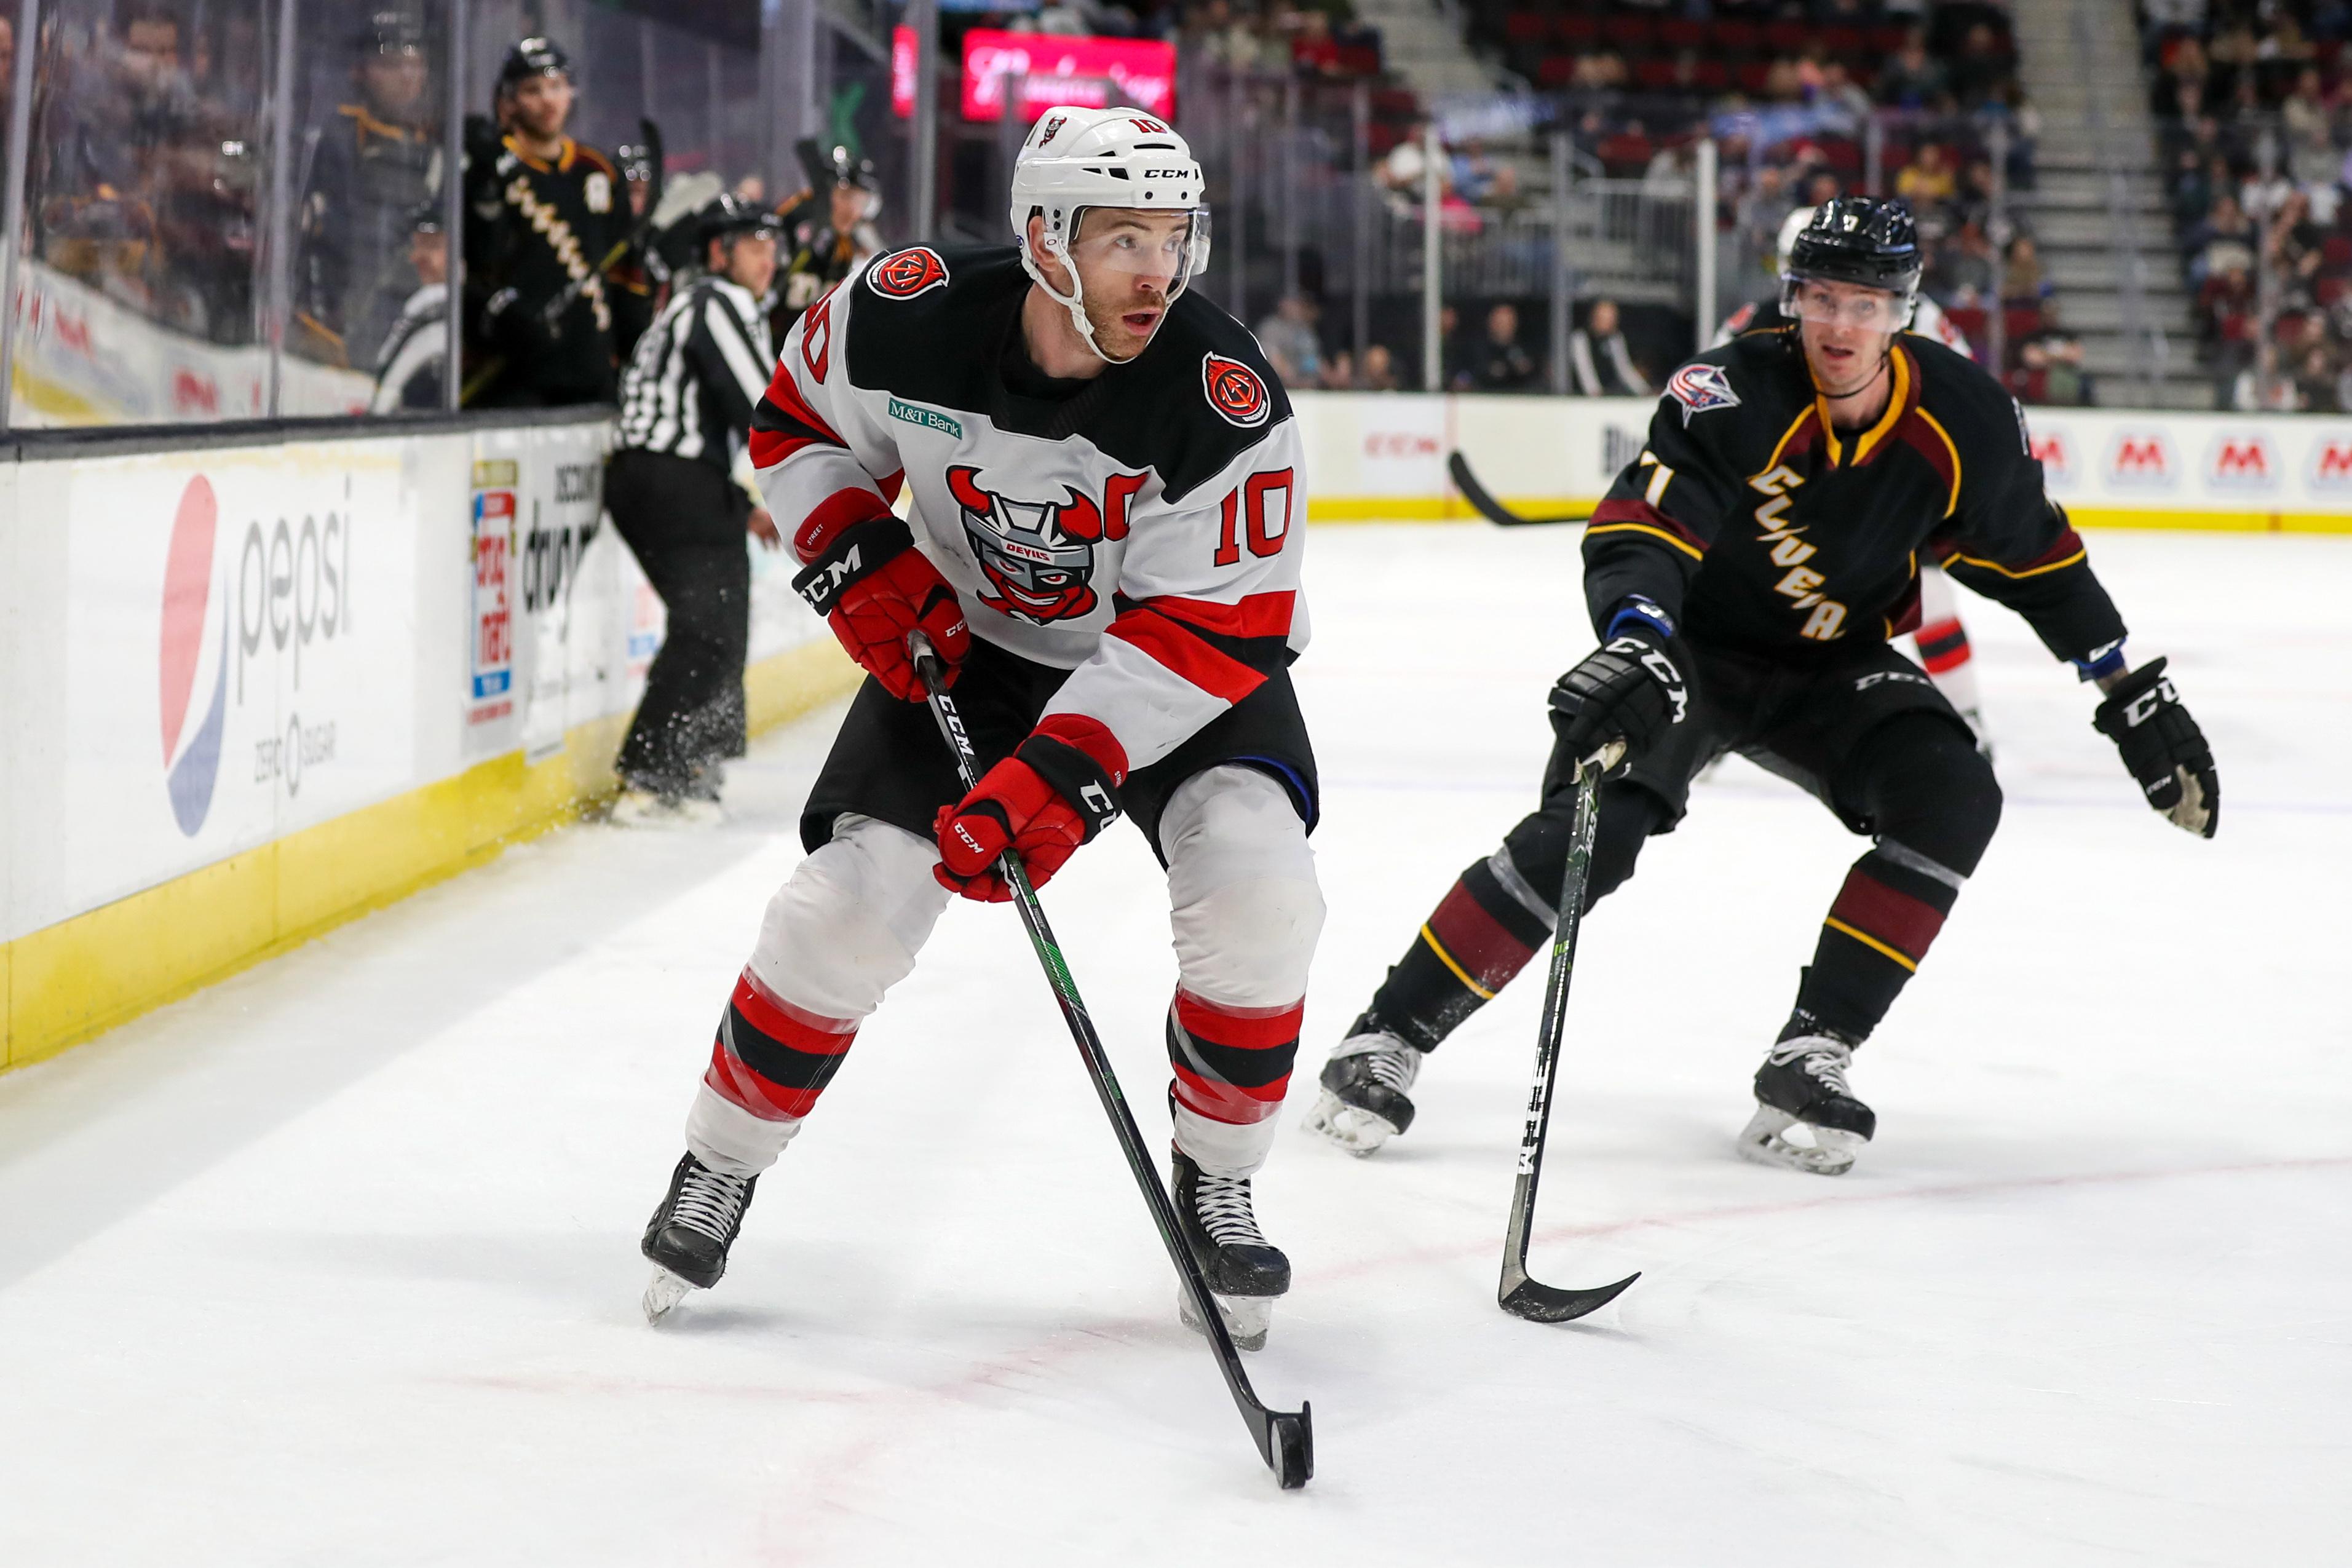 AHL: FEB 09 Binghamton Senators at Cleveland Monsters